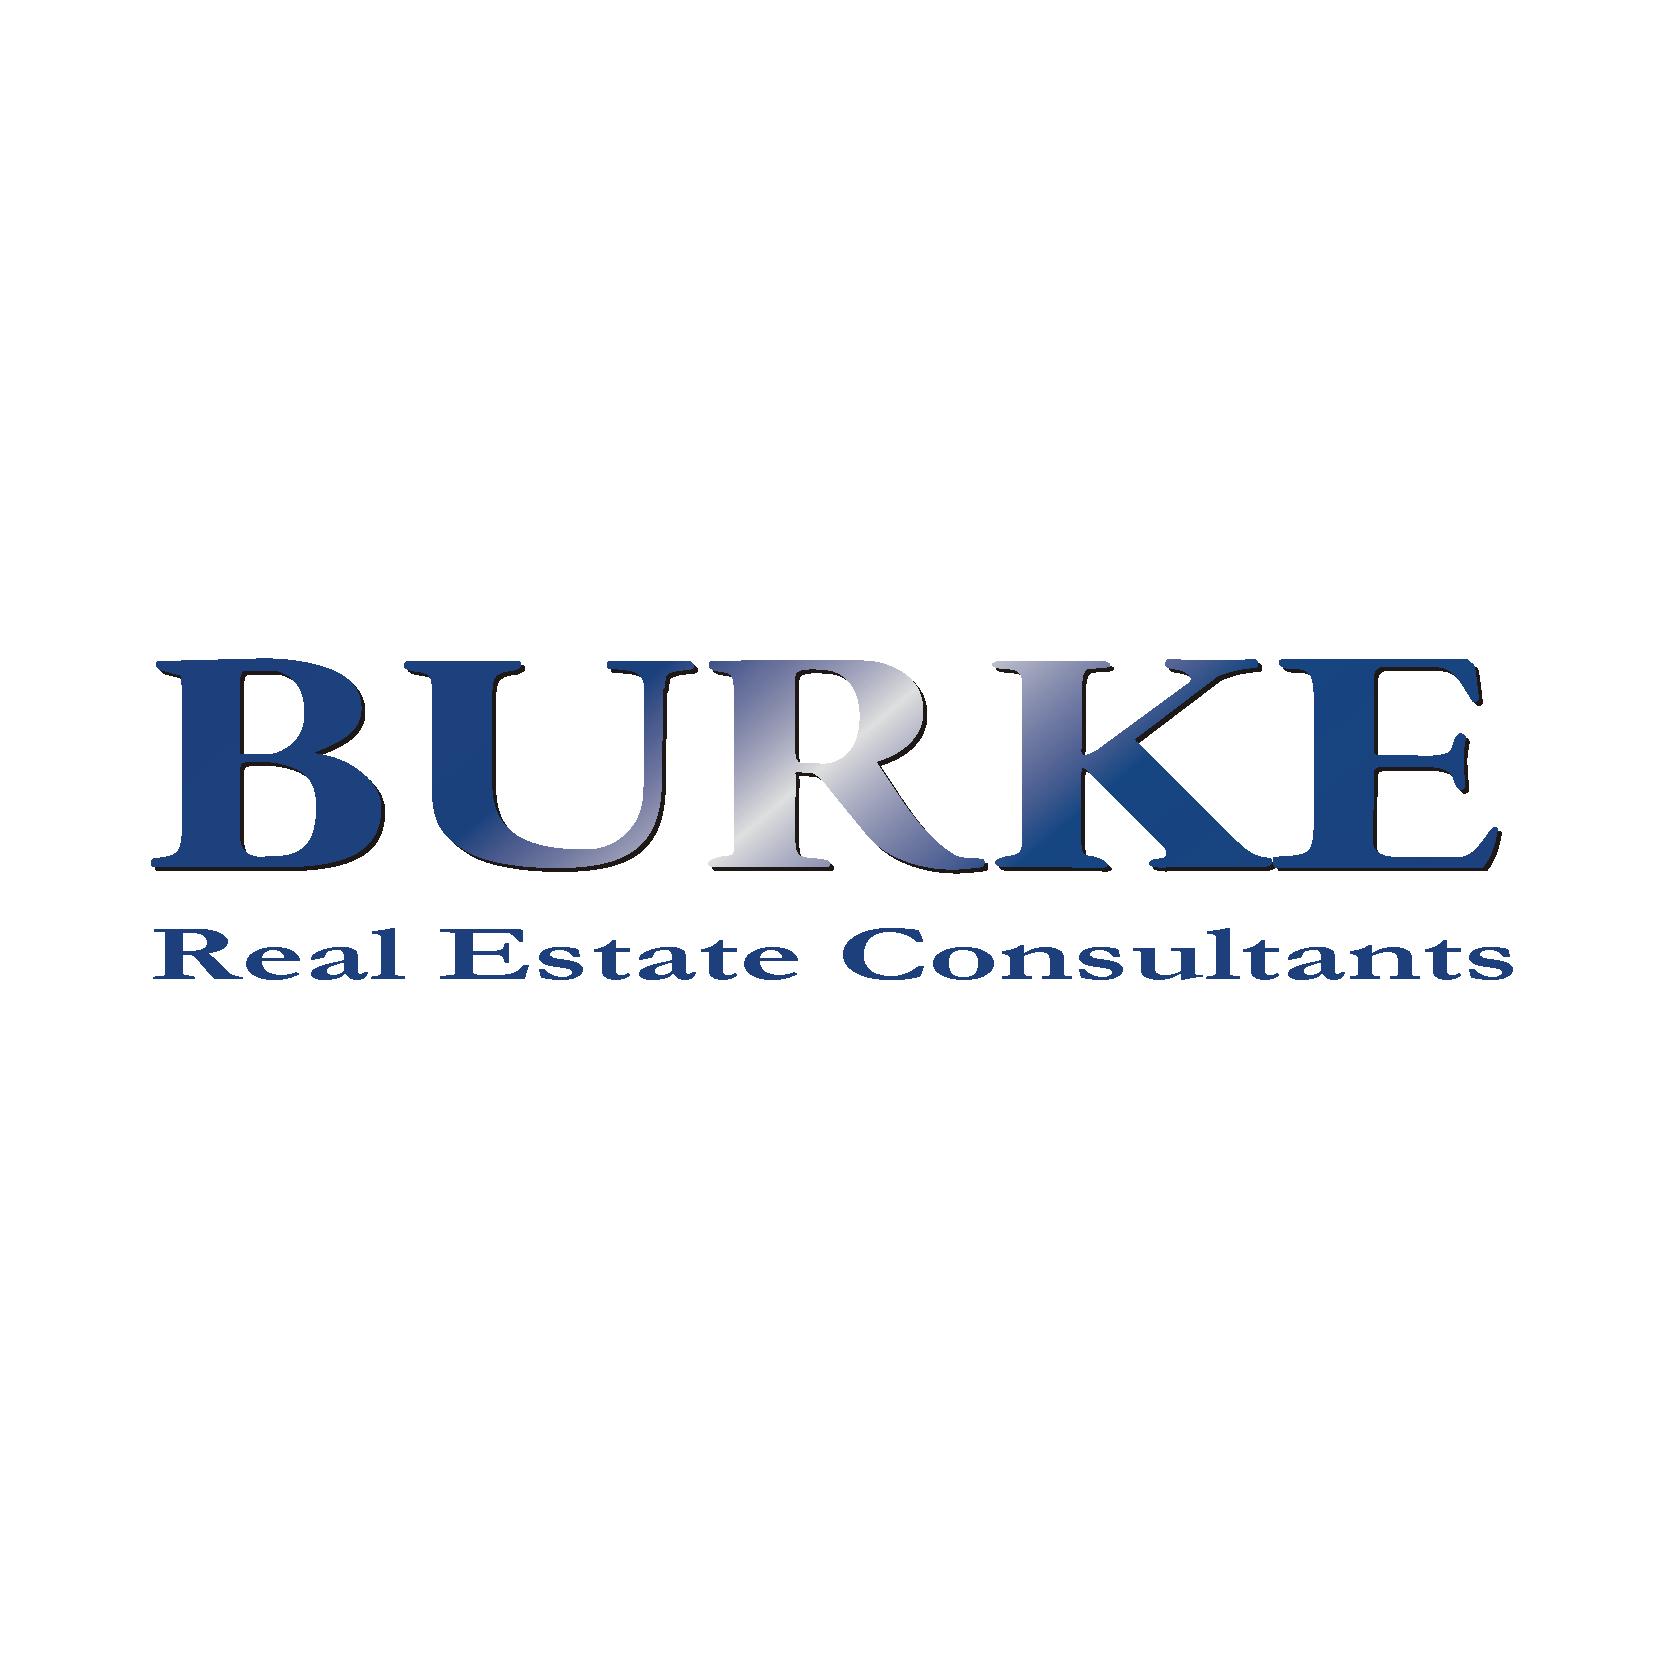 Burke Real Estate